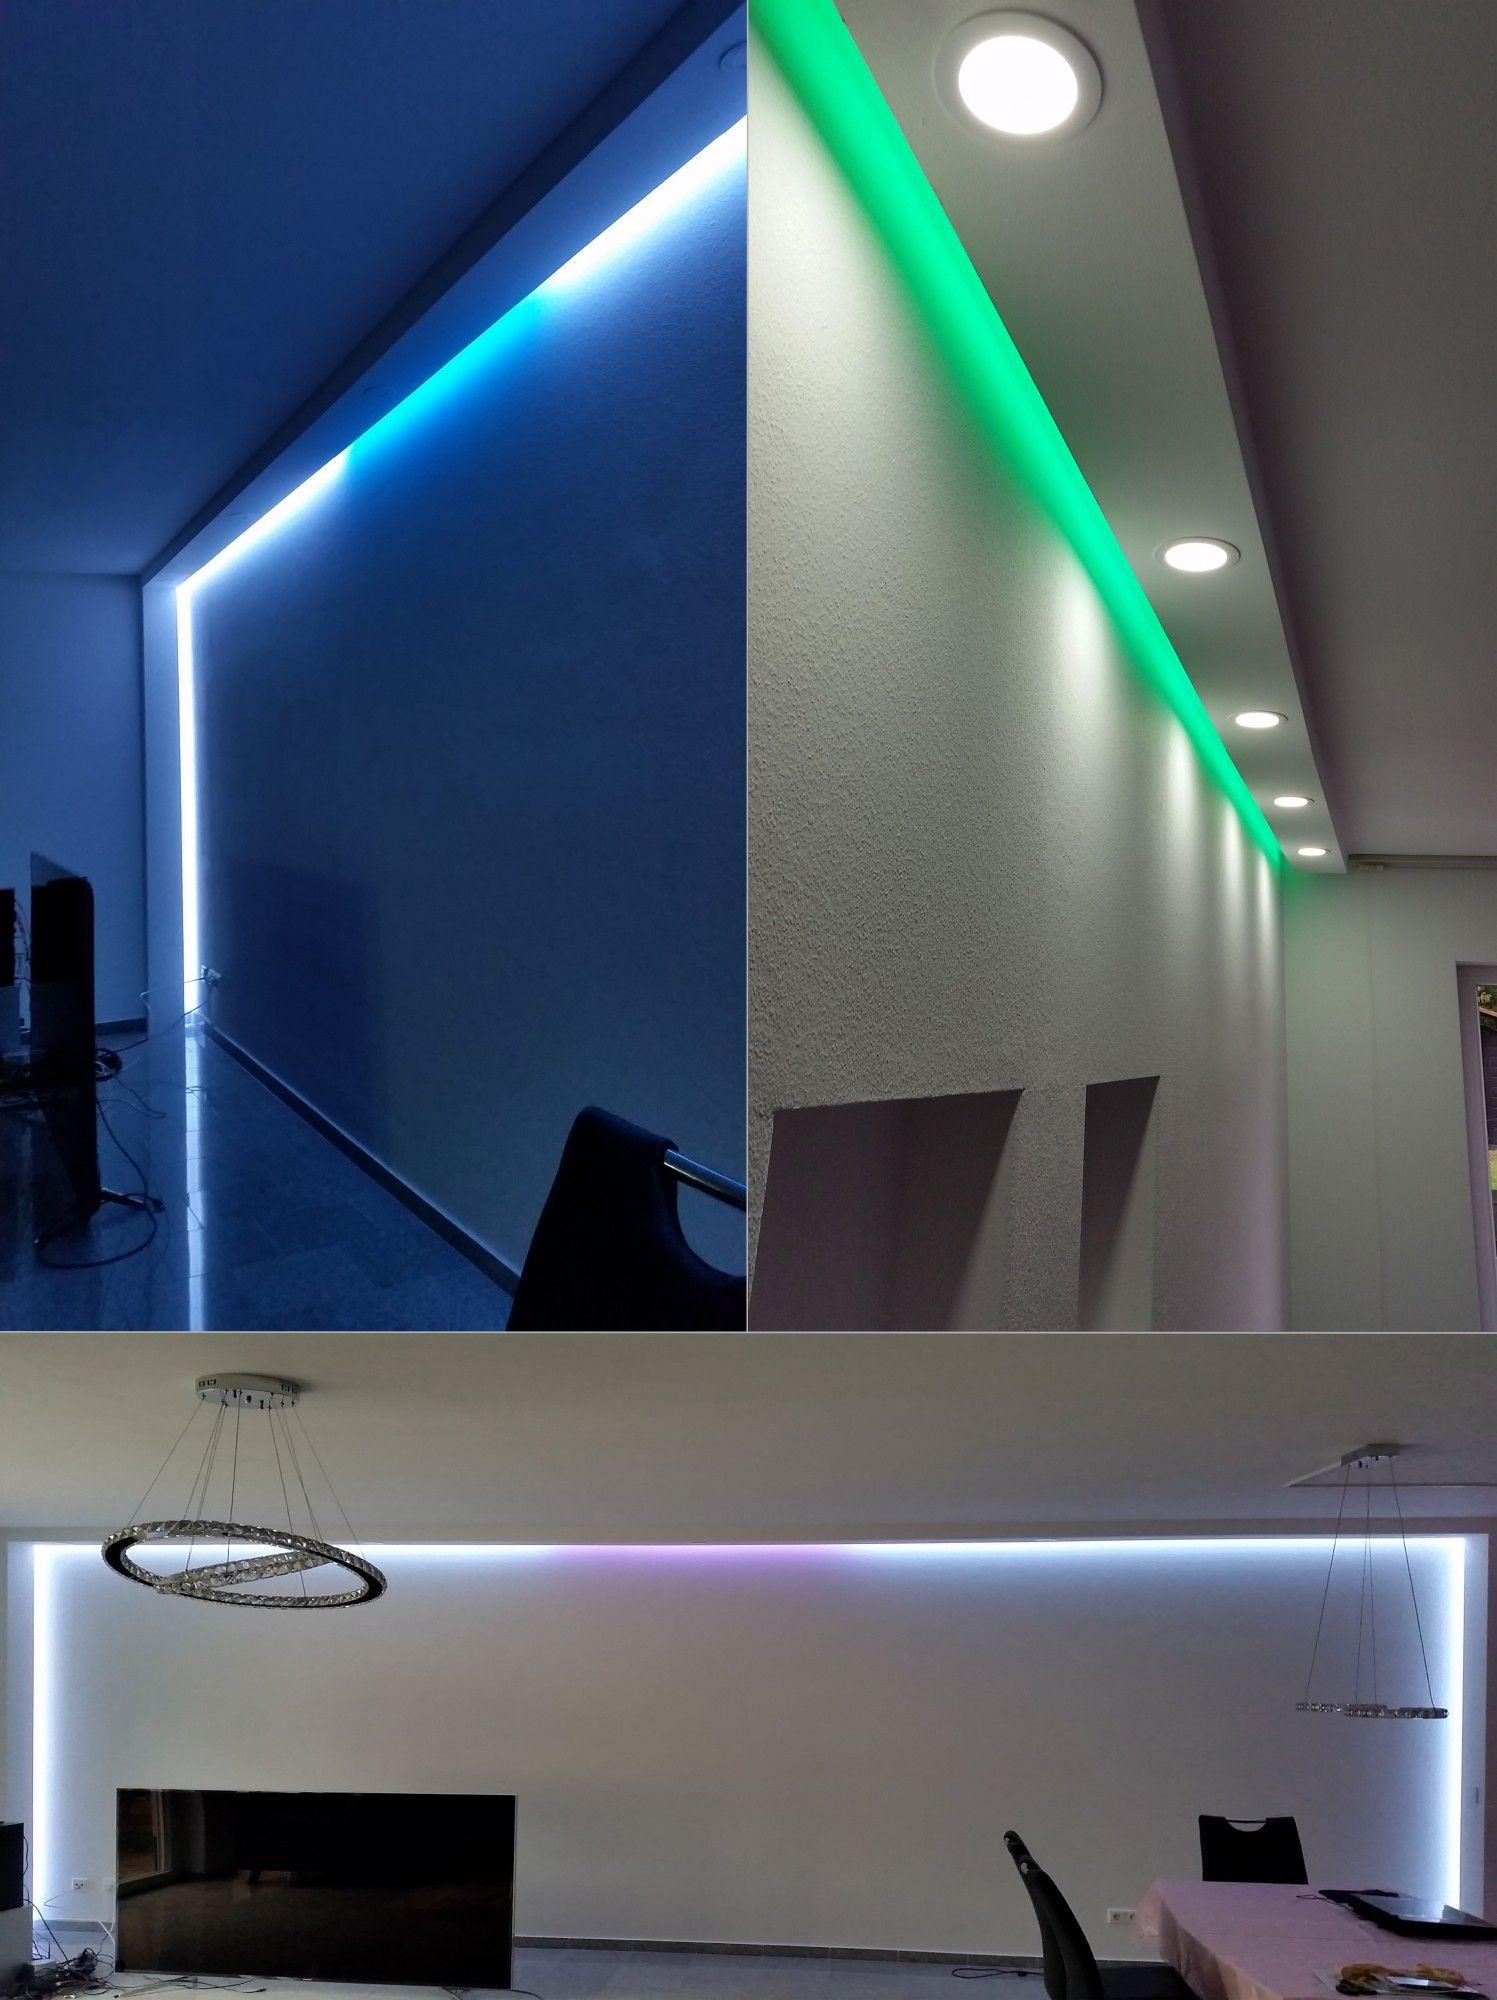 10 meter pu spots kasten led leuchten stuck deckenprofil. Black Bedroom Furniture Sets. Home Design Ideas